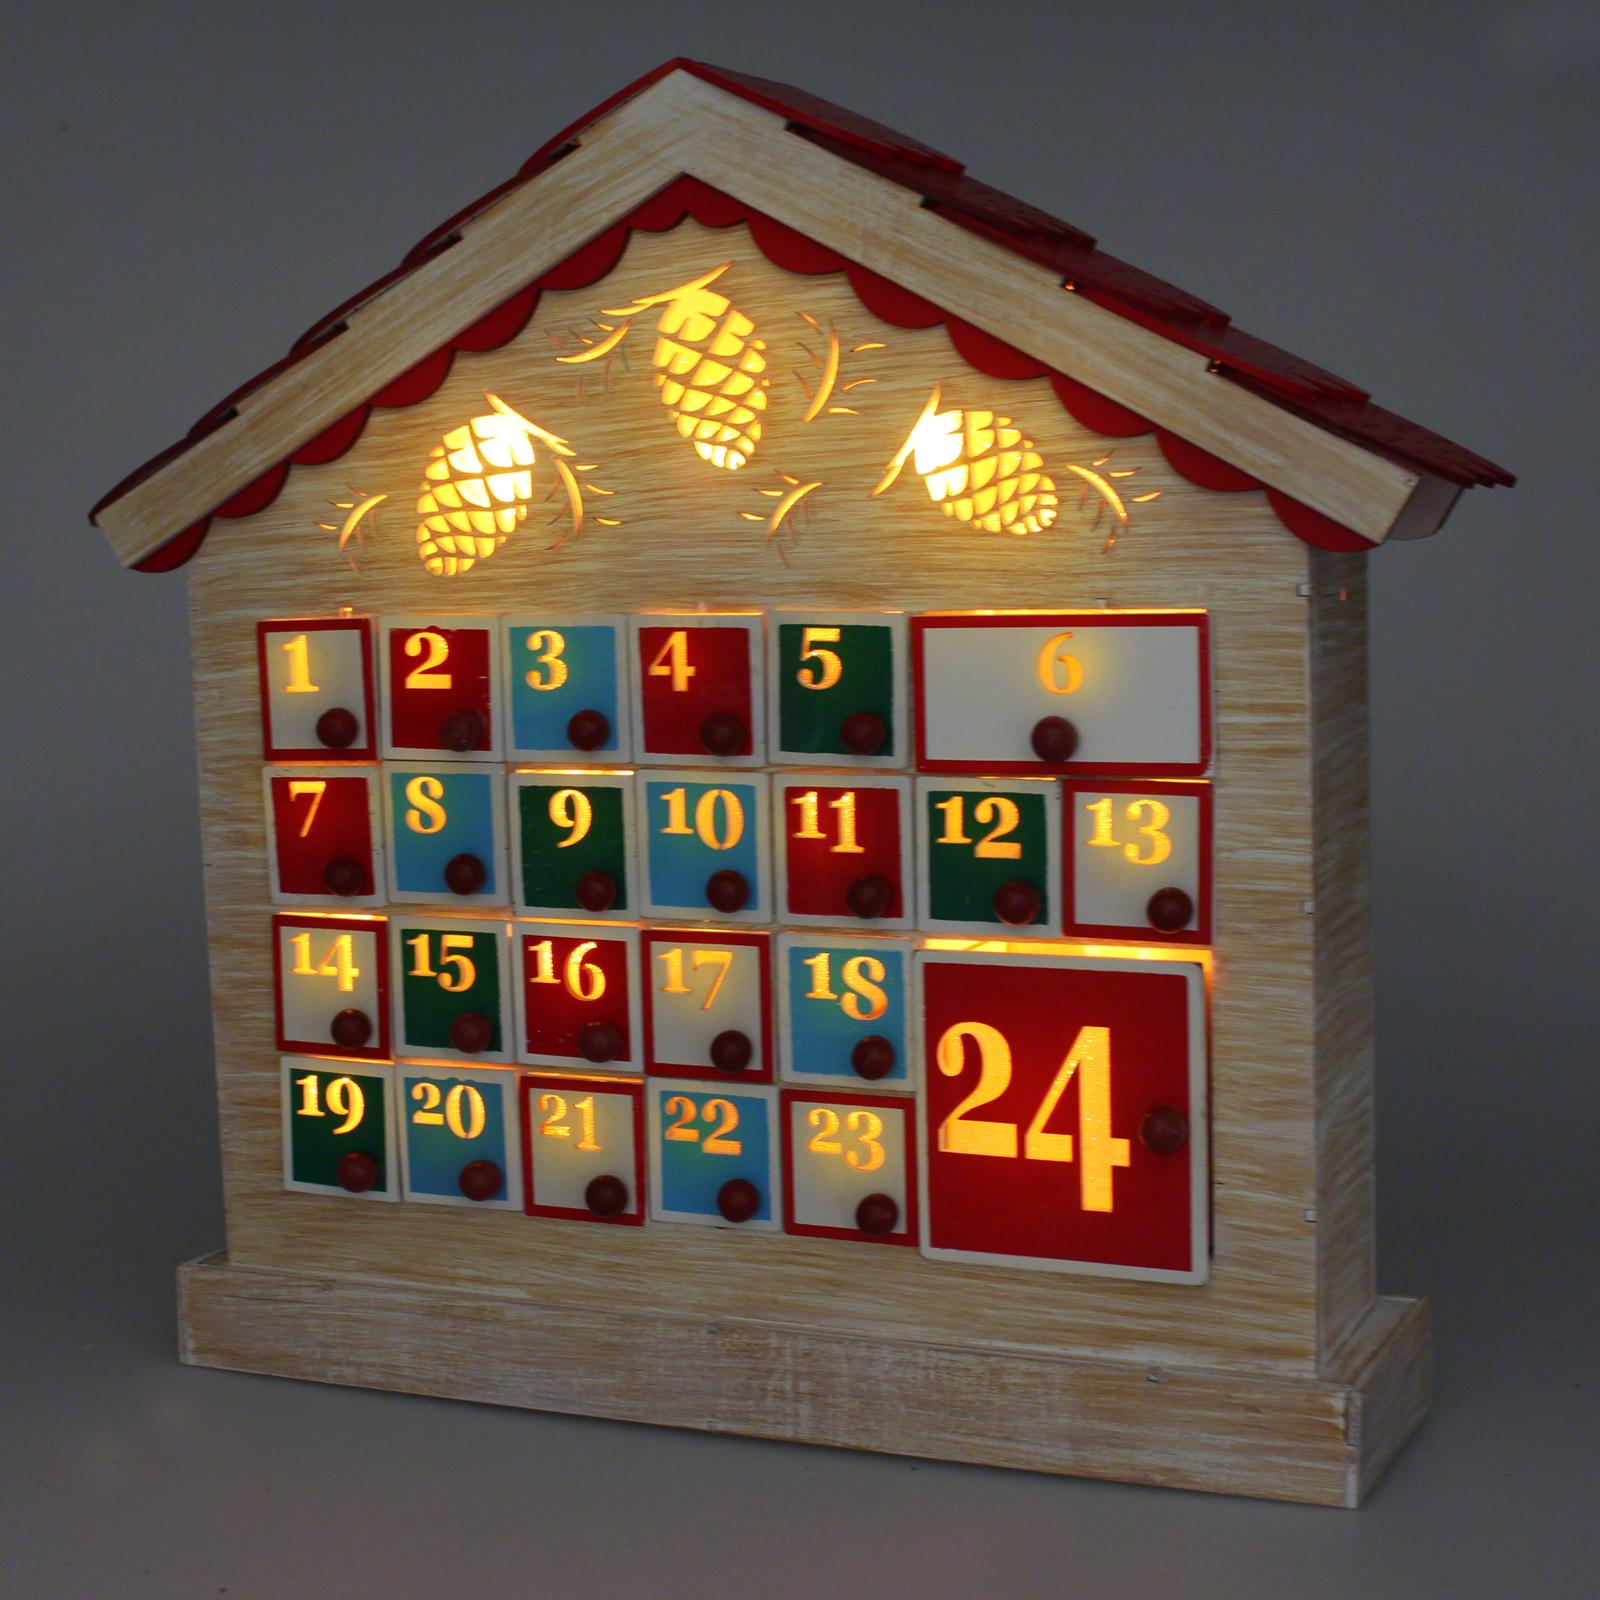 LED Wooden Advent Calendar House